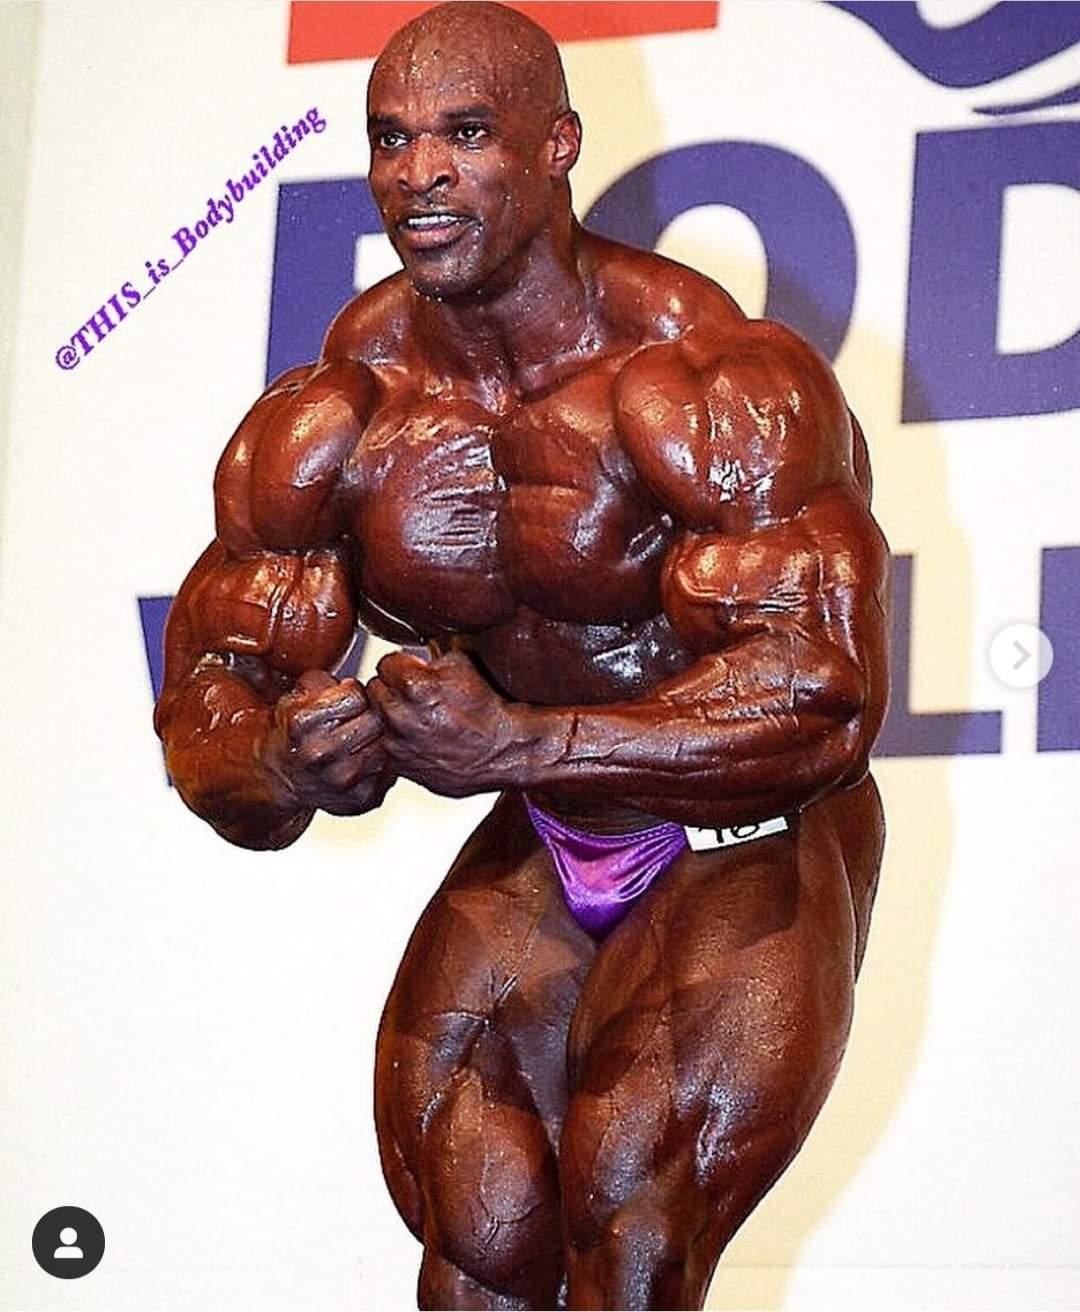 ronnie coleman pro ifbb 8 volte mr olympia al 1999 World Pro Championships